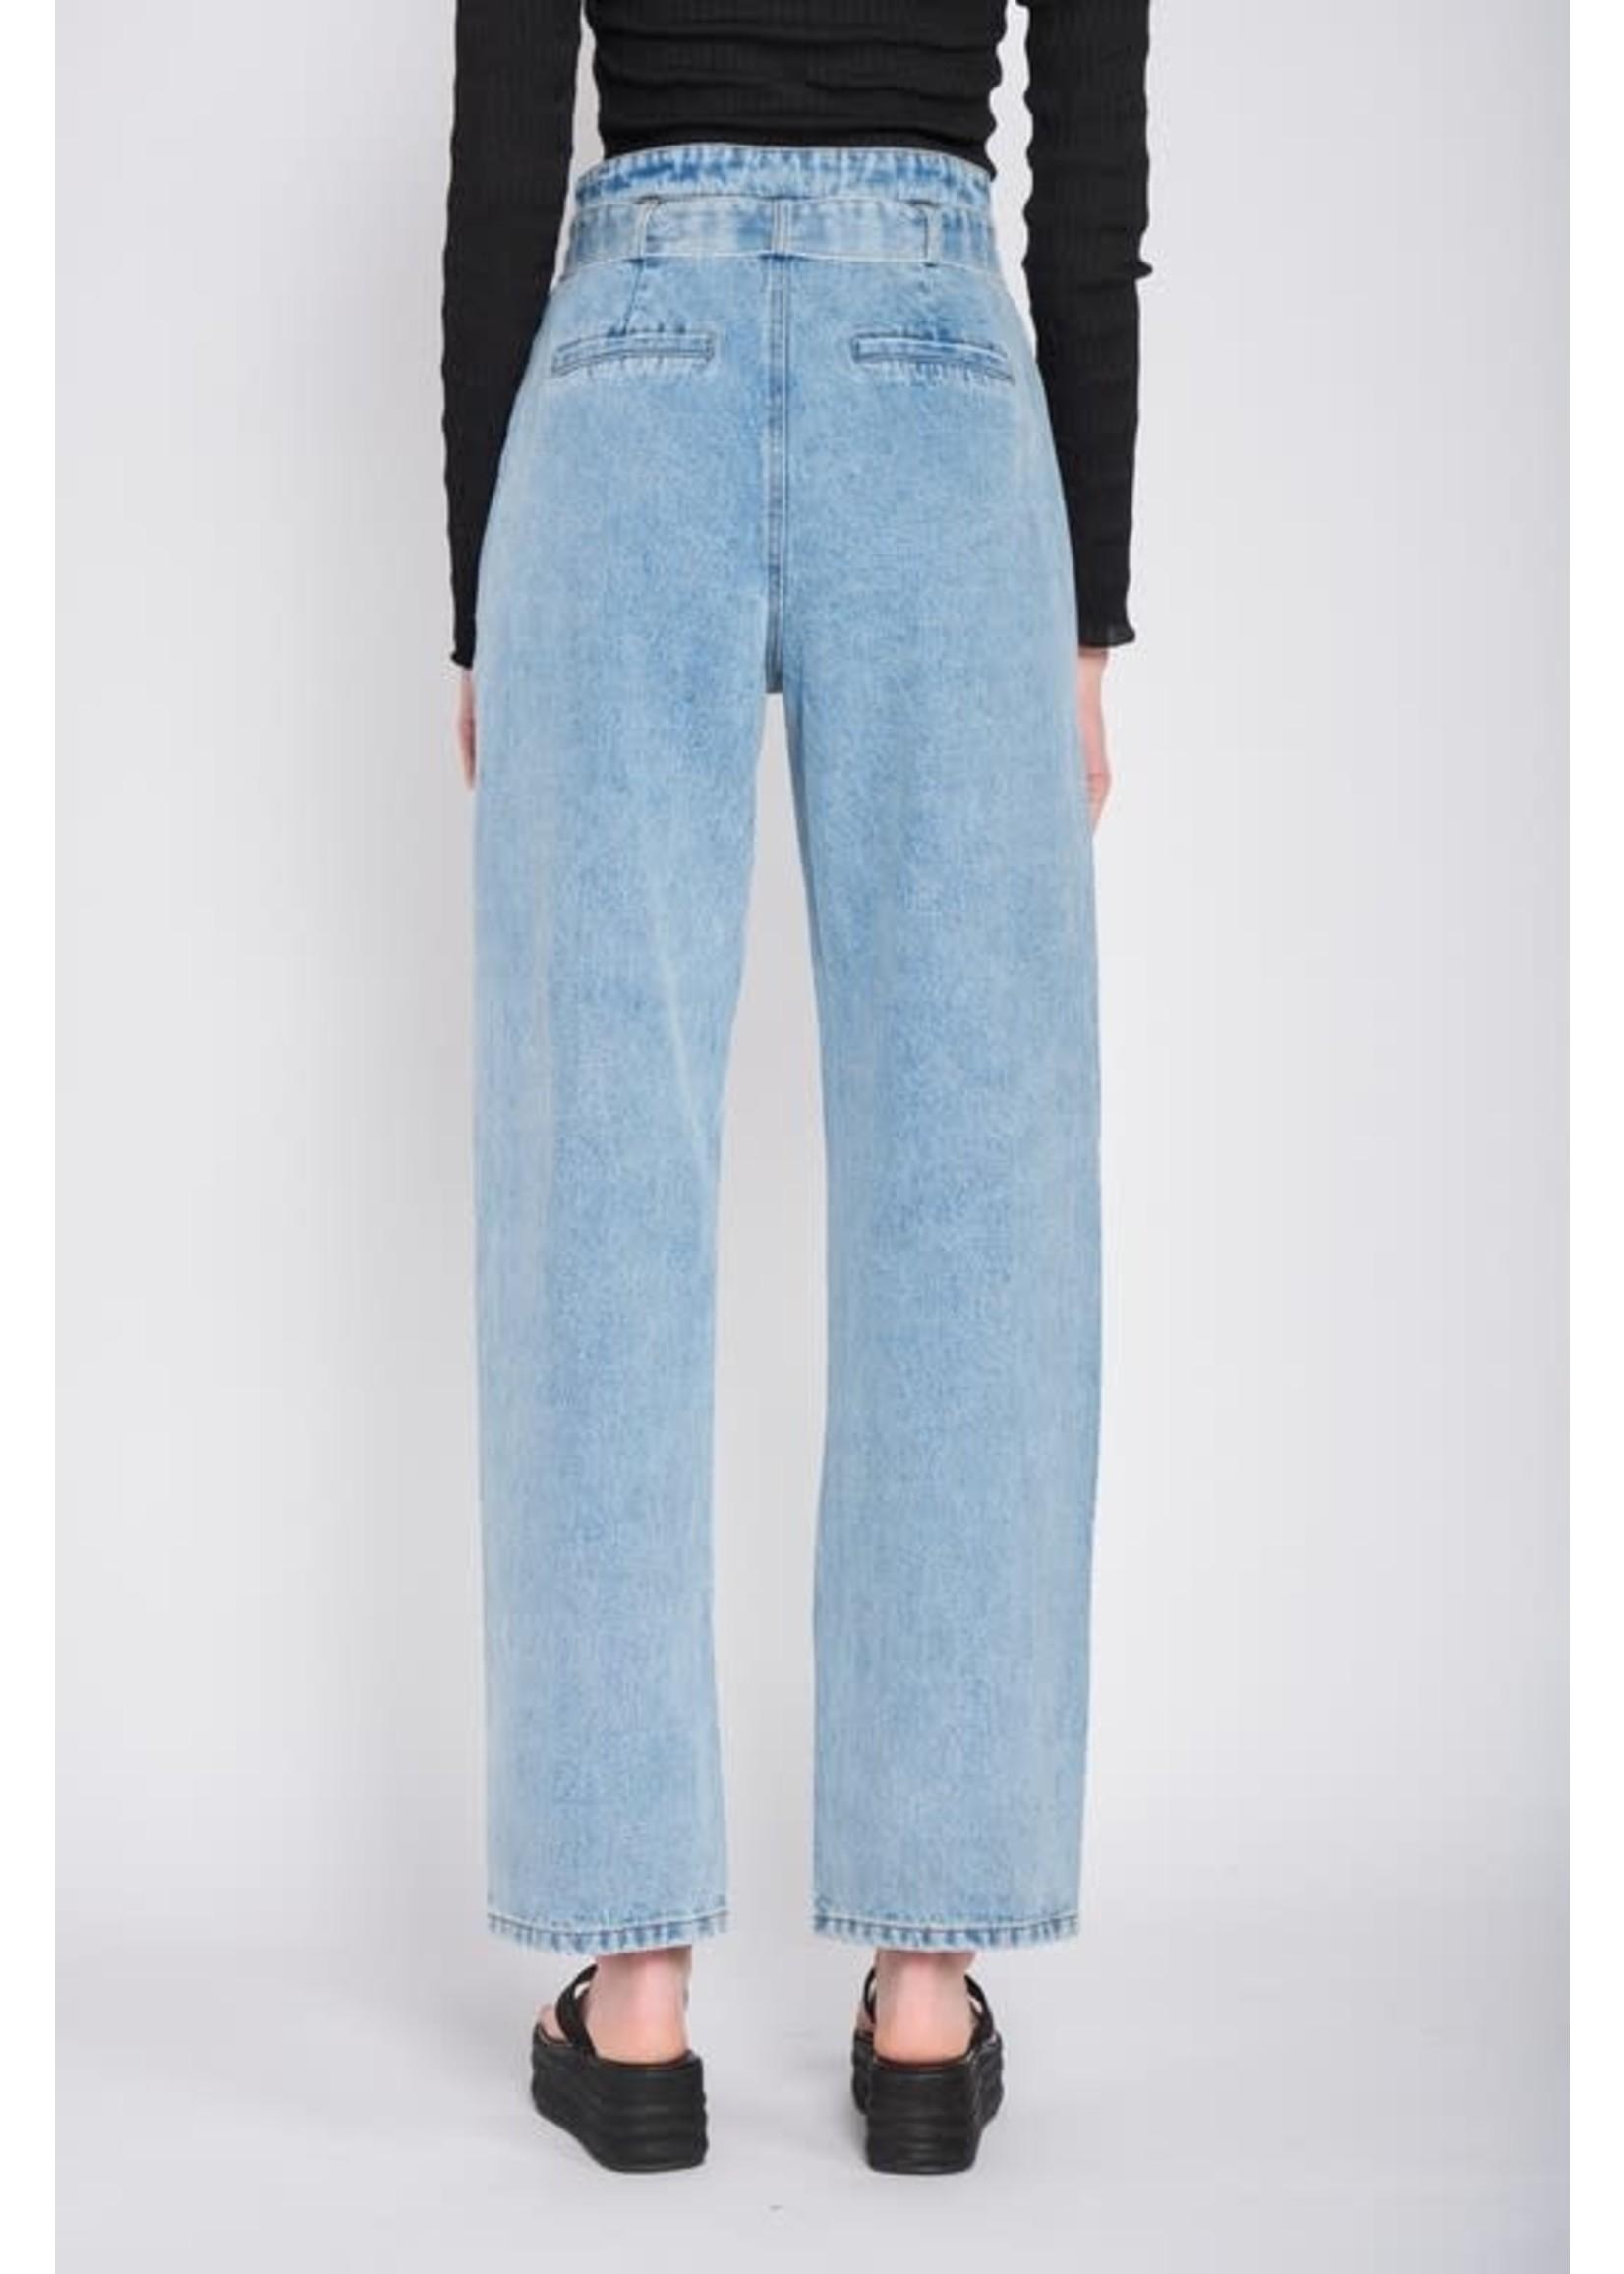 Emory Park Straight Leg Jeans With Belt - IMA6465P